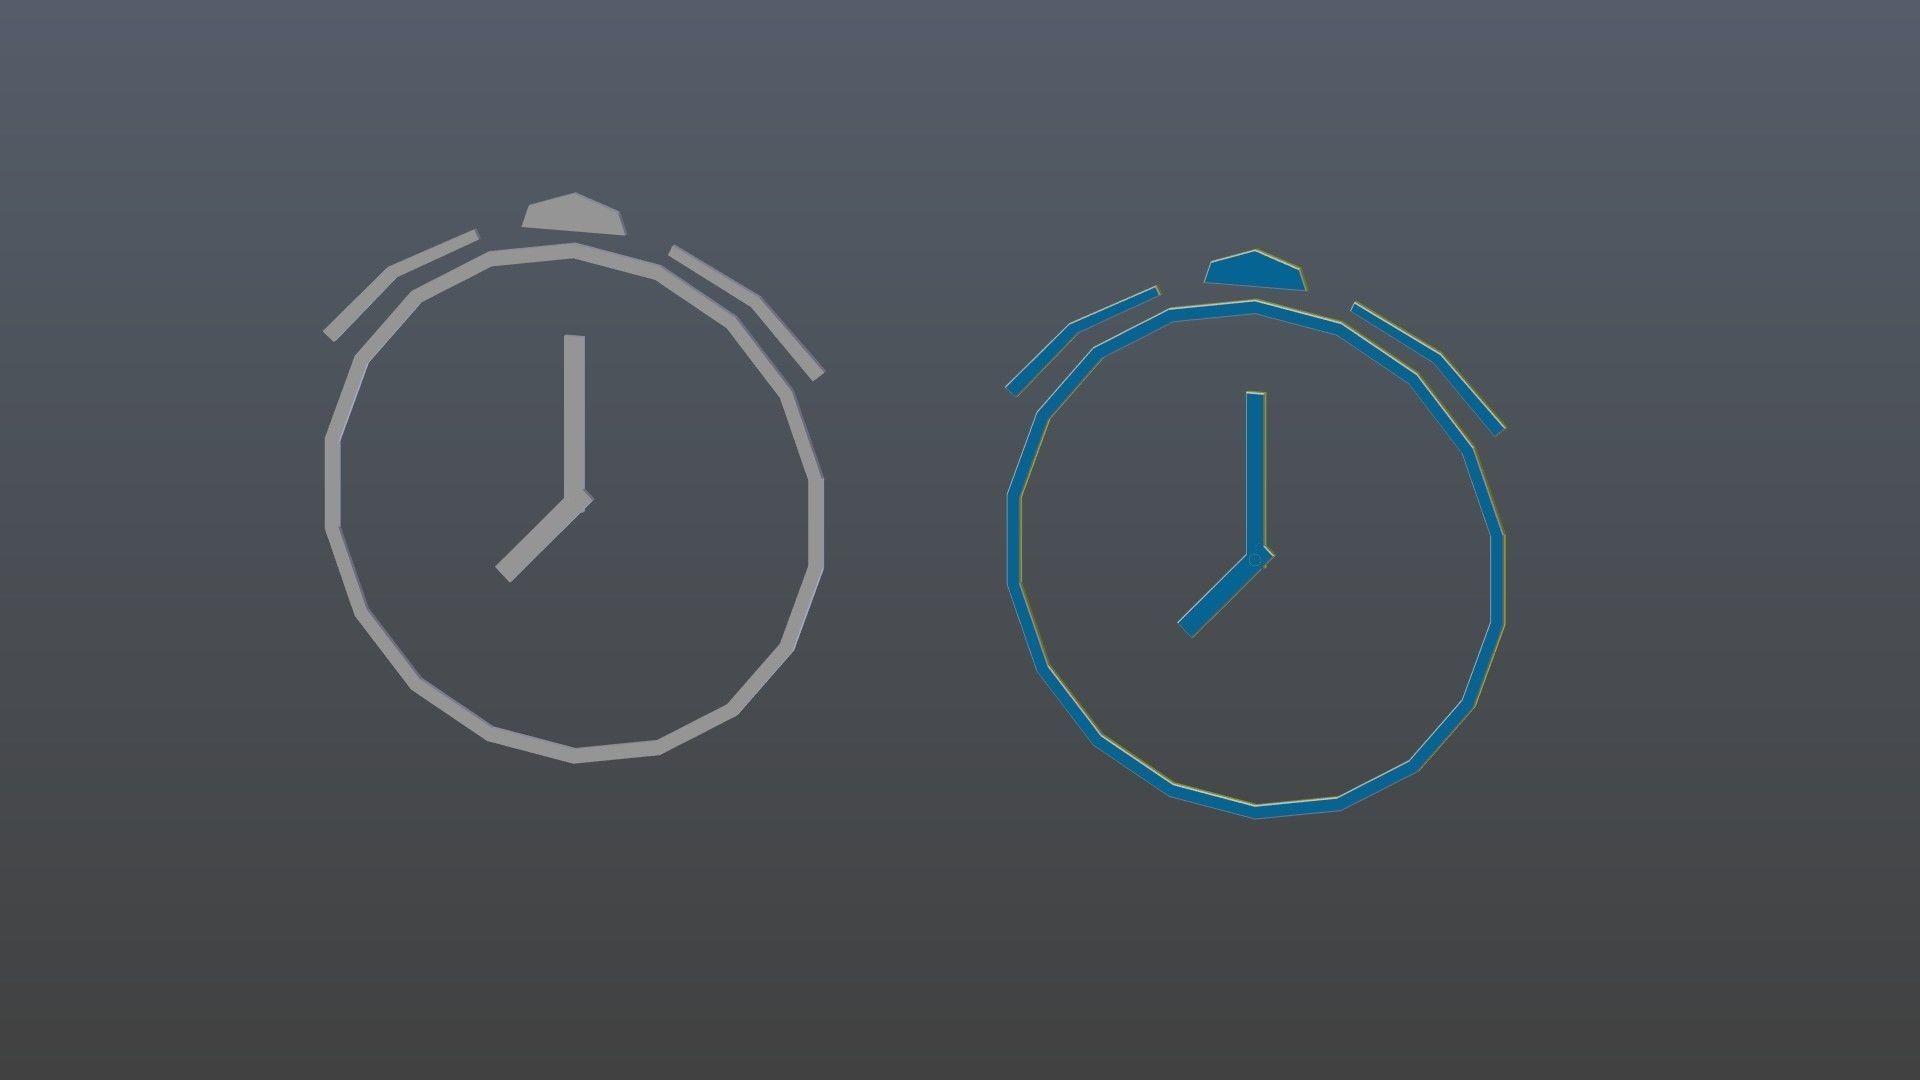 Low poly Alarm symbols